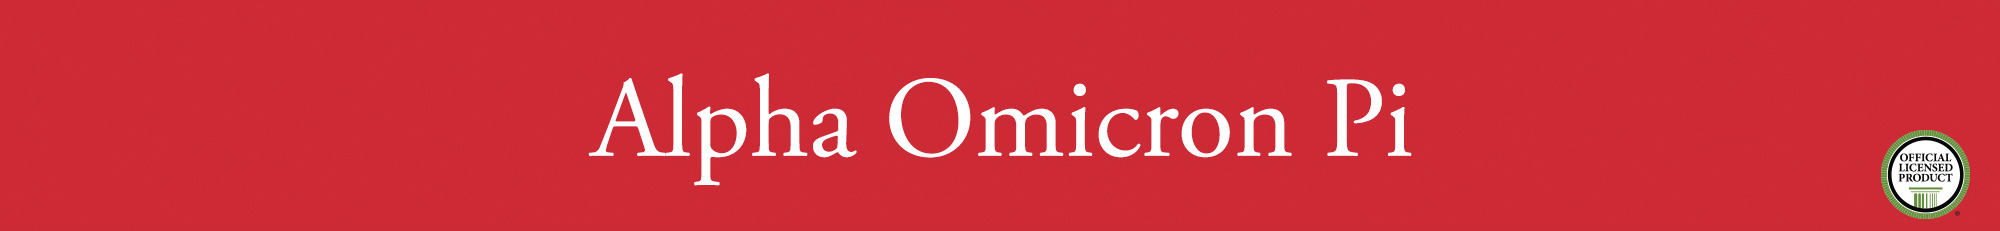 Alpha Omicron Pi Banner